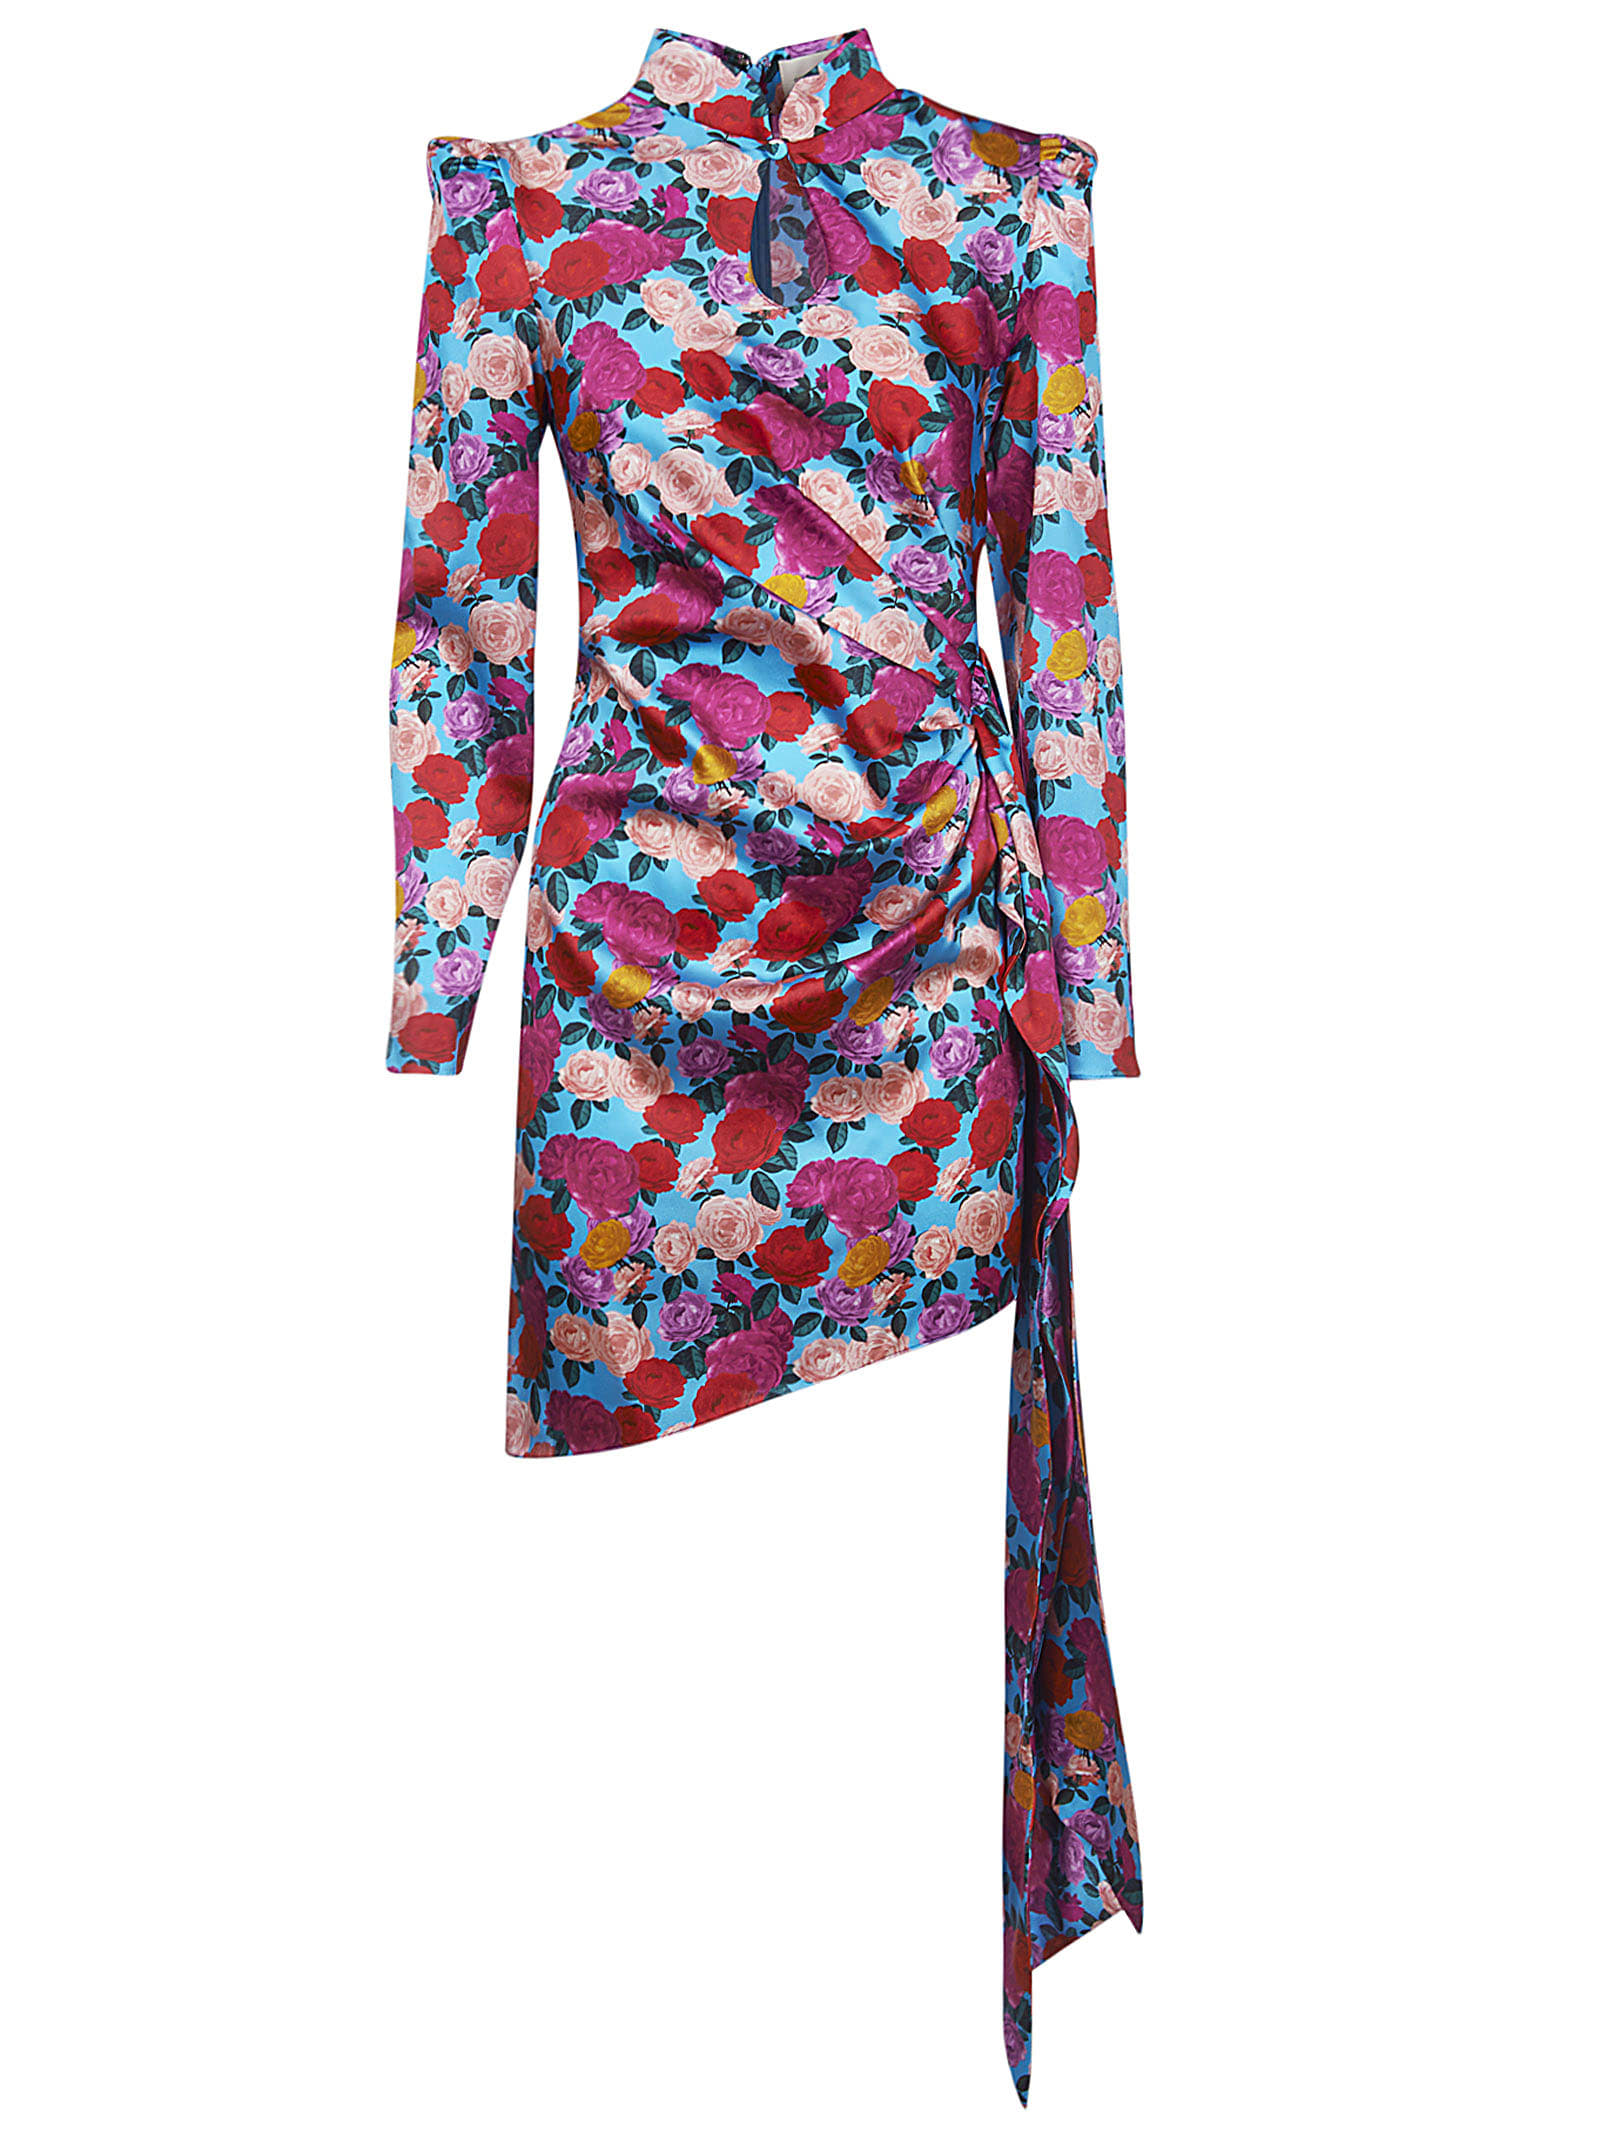 Buy Giuseppe di Morabito Floral Print Gathered Dress online, shop Giuseppe di Morabito with free shipping